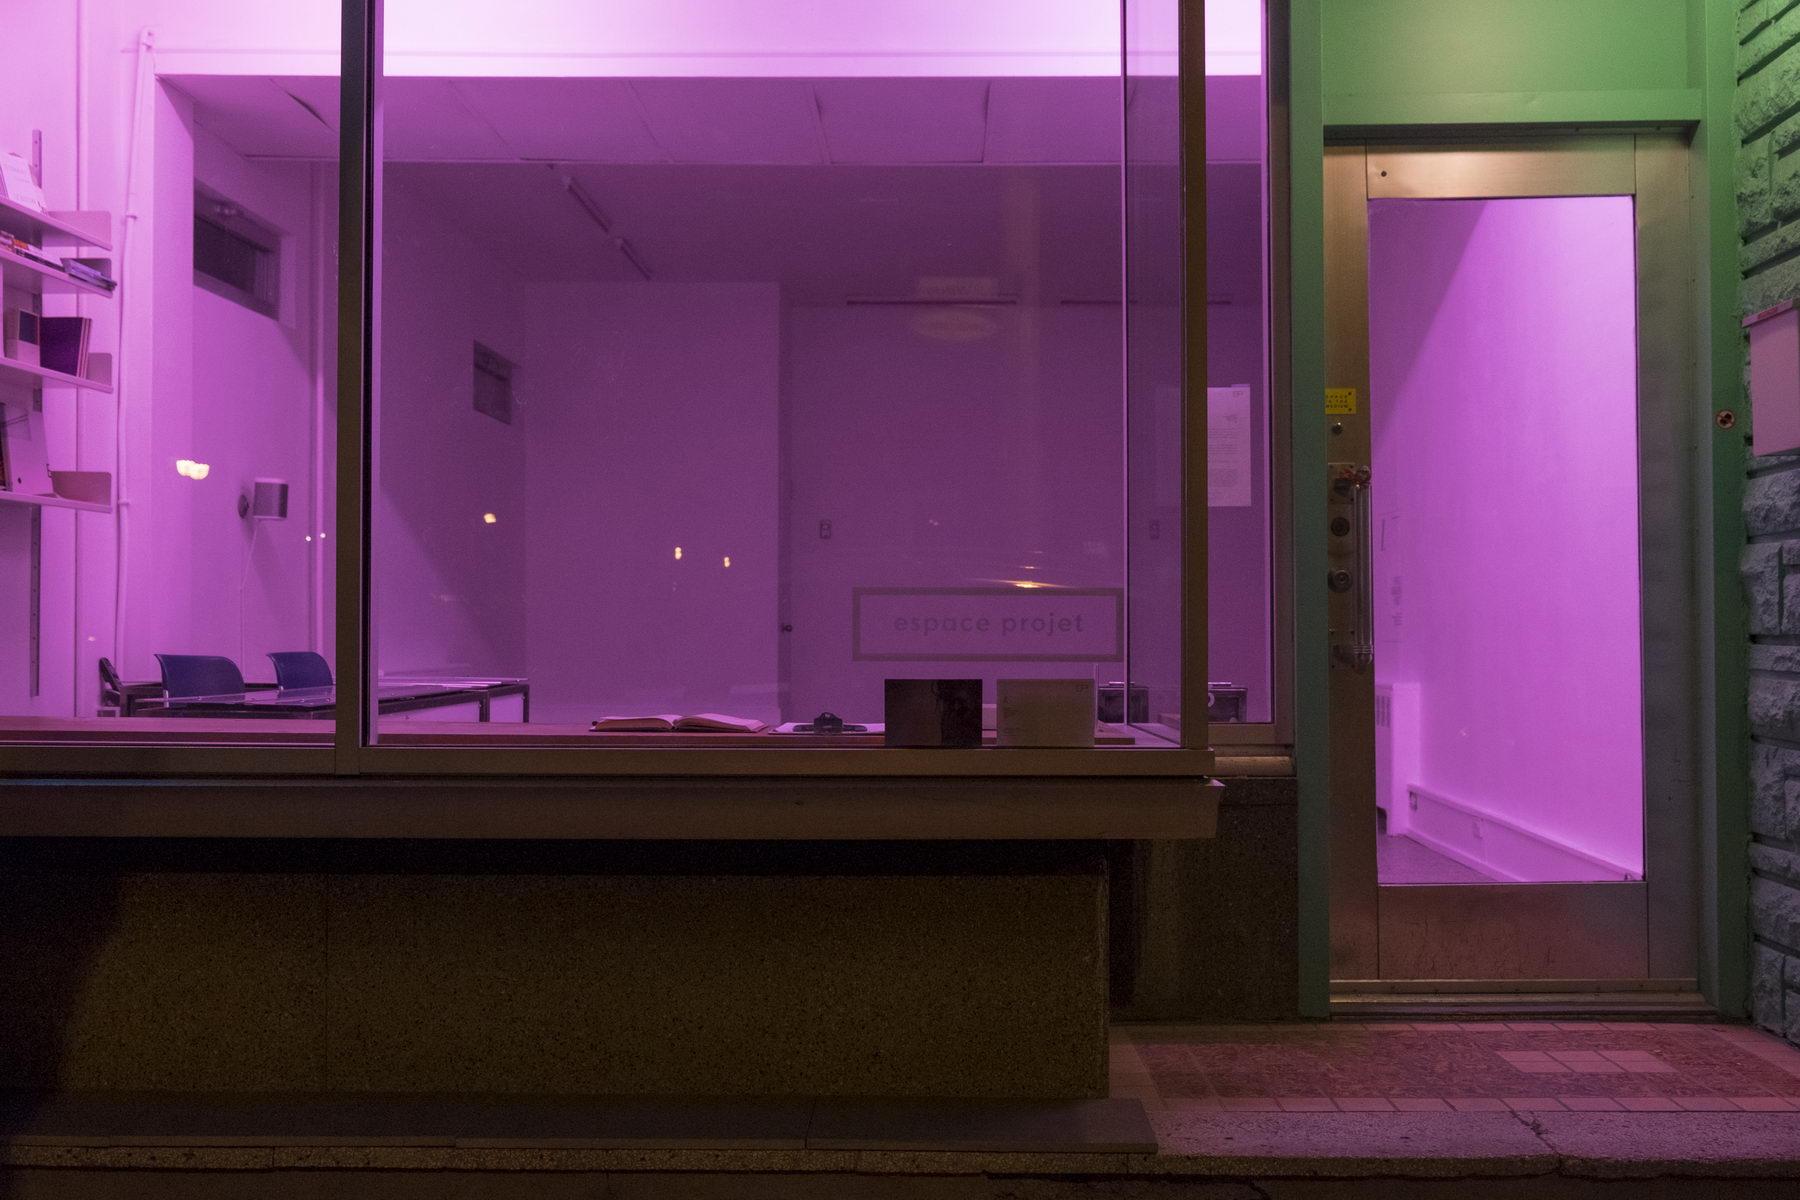 Galerie Espace-Projet, rue Villeray